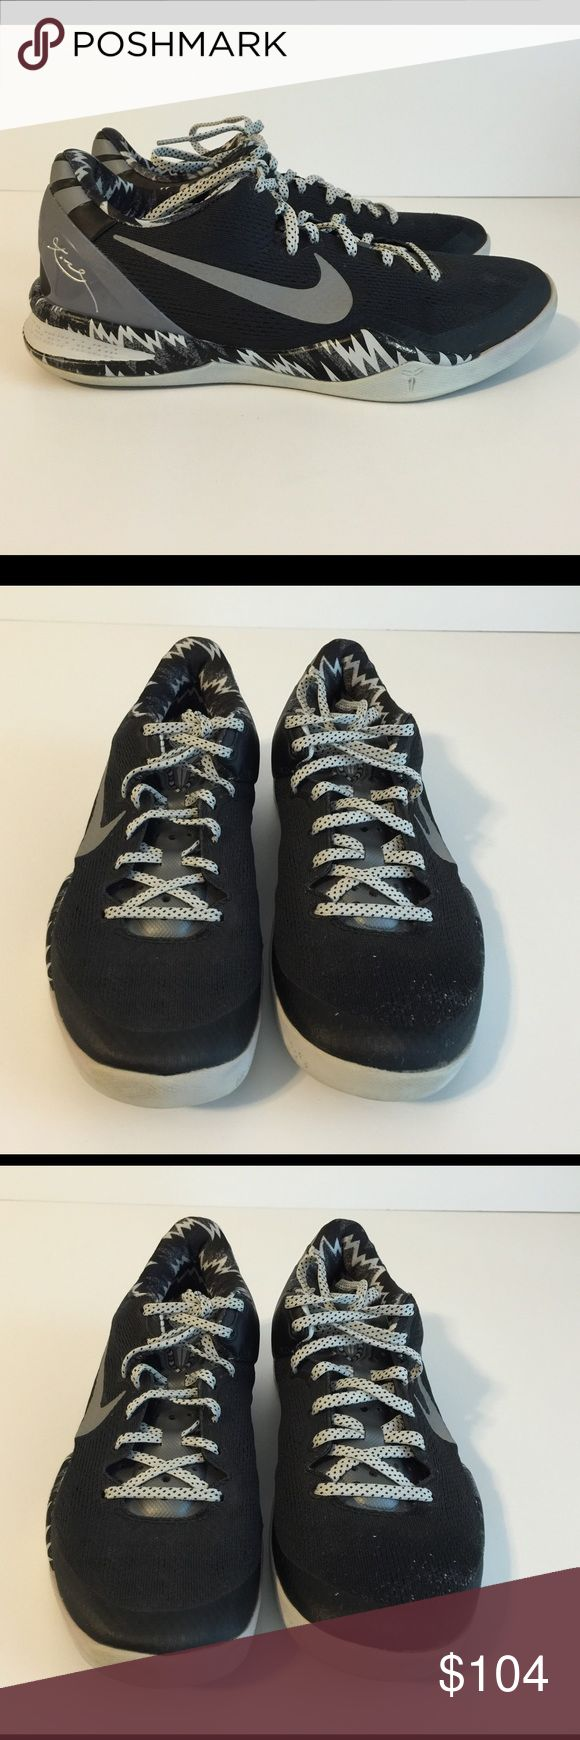 a7fdadb0ecc2 Kobe 8 Elite PP Black Flash Lime Grey 613959 003 - Out Professionals